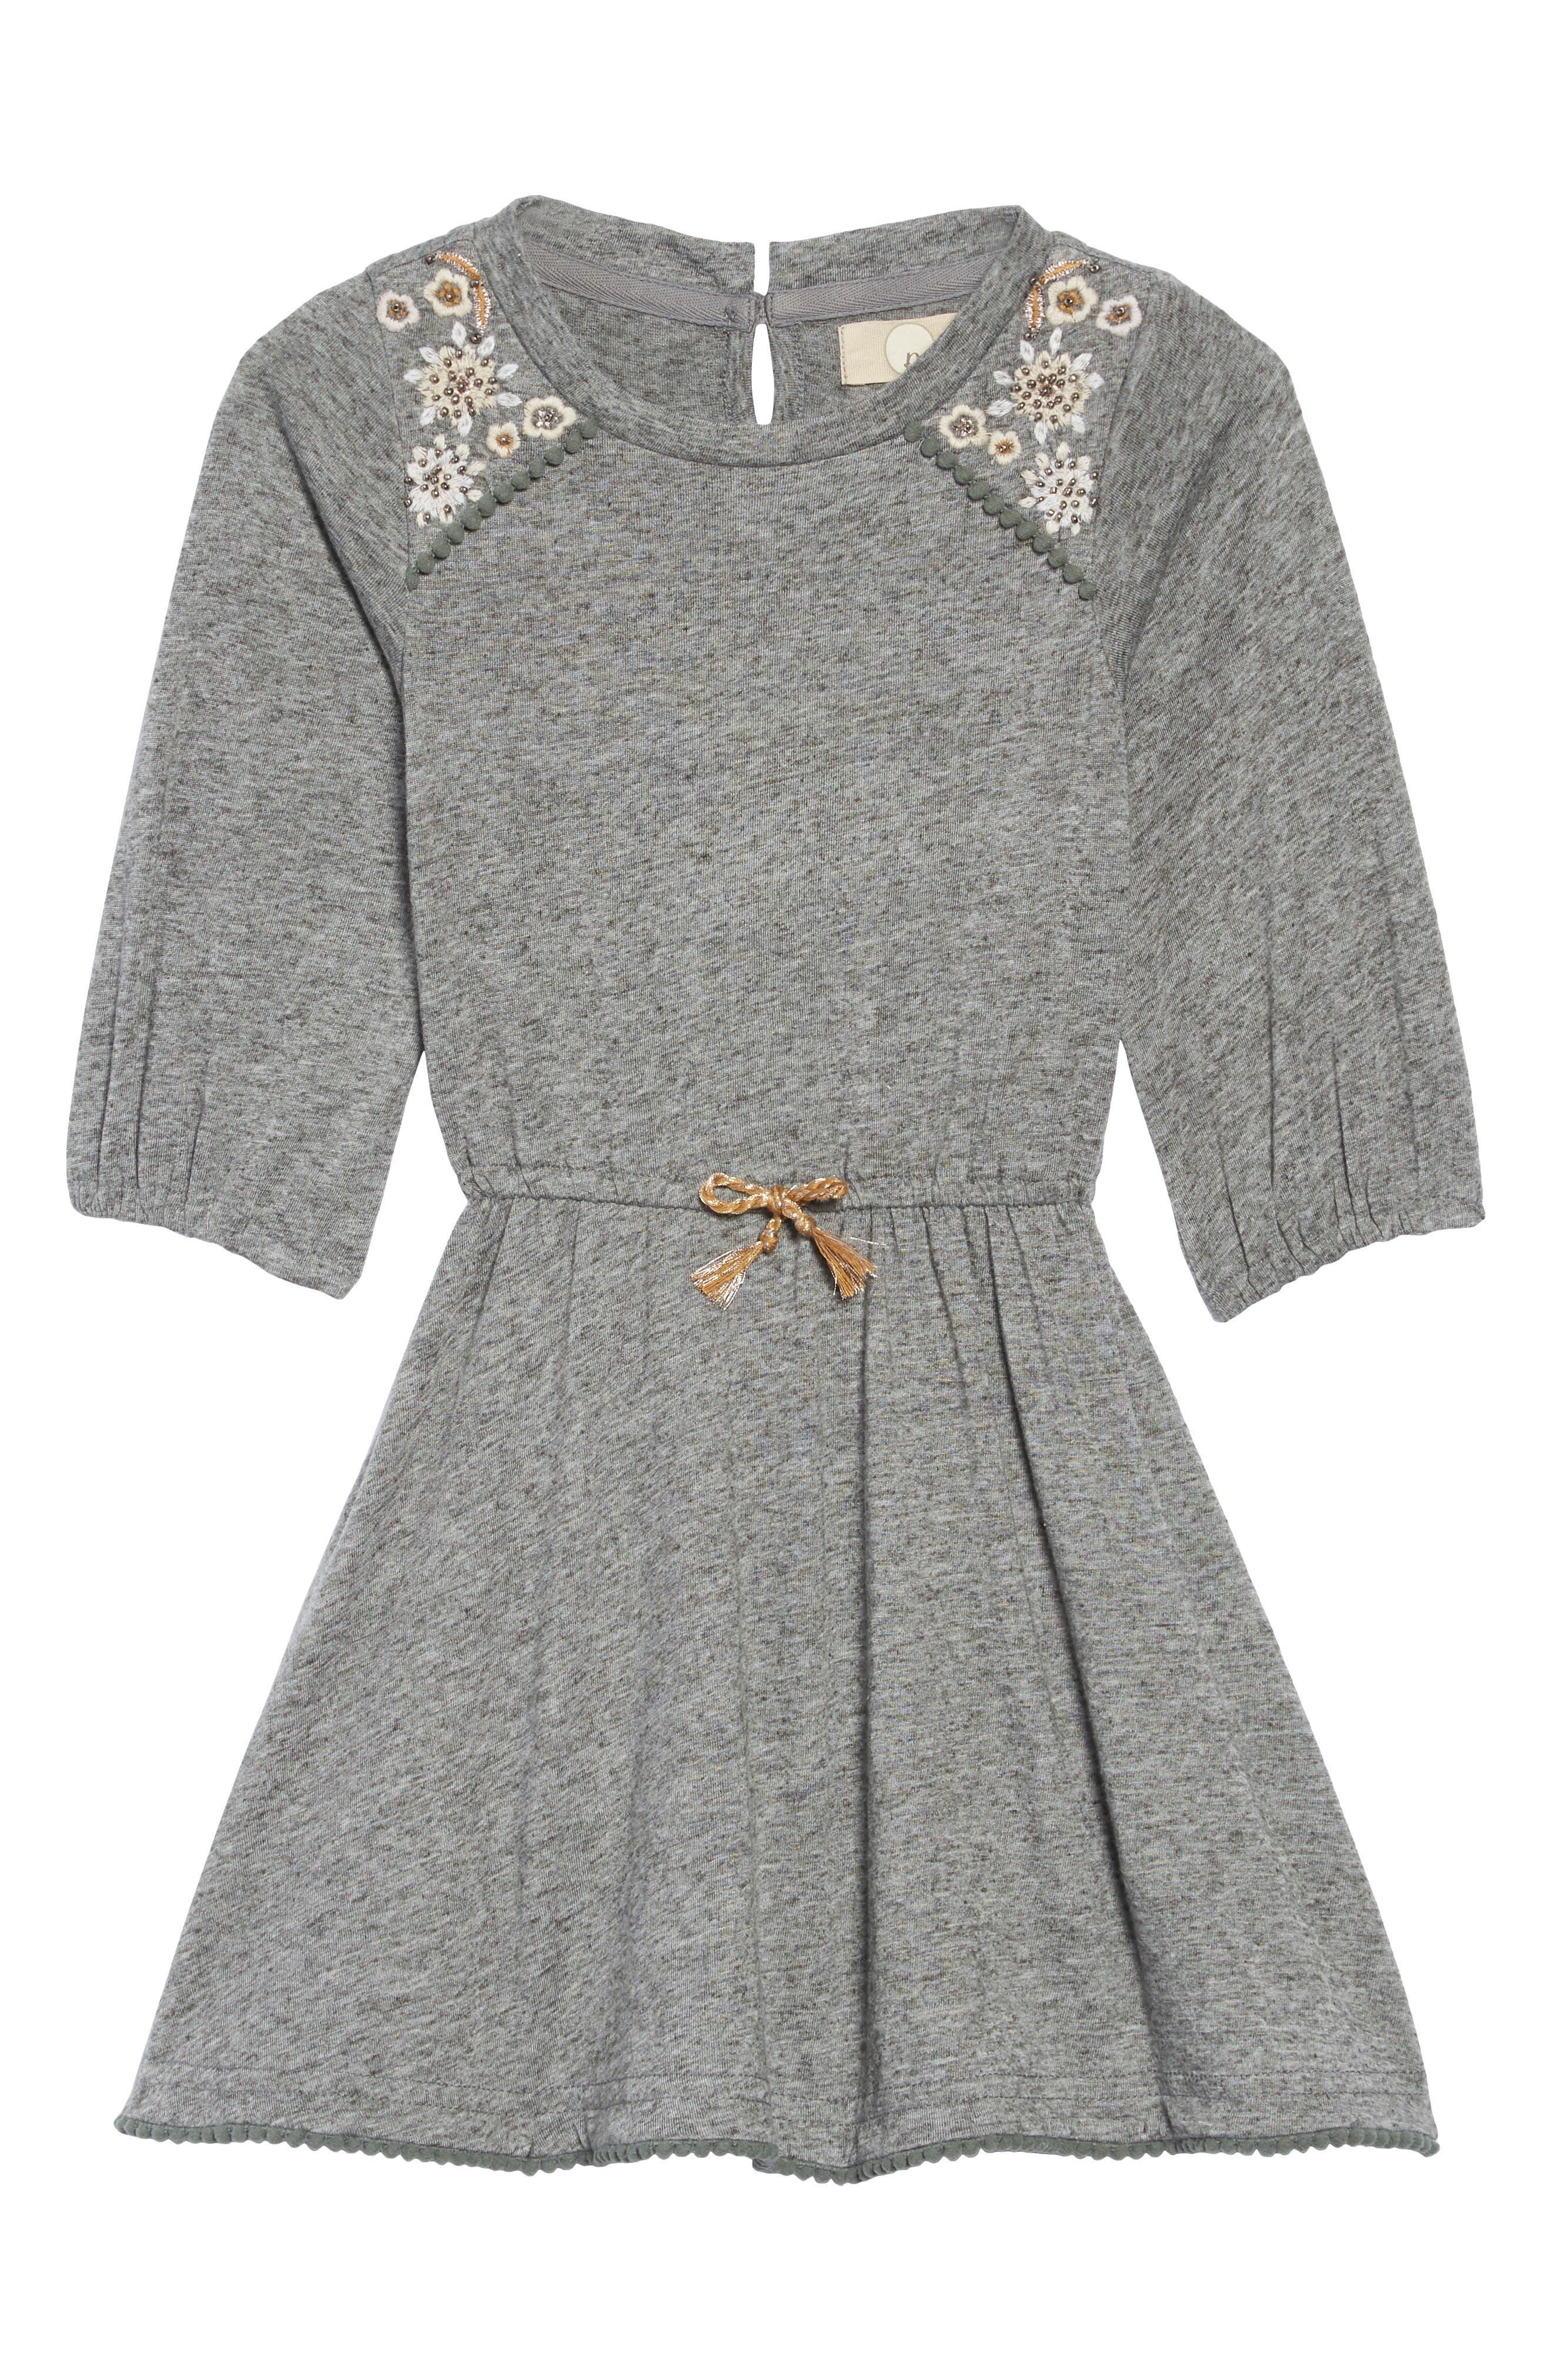 Morgan Embellished Dress,                             Main thumbnail 1, color,                             HEATHER GREY